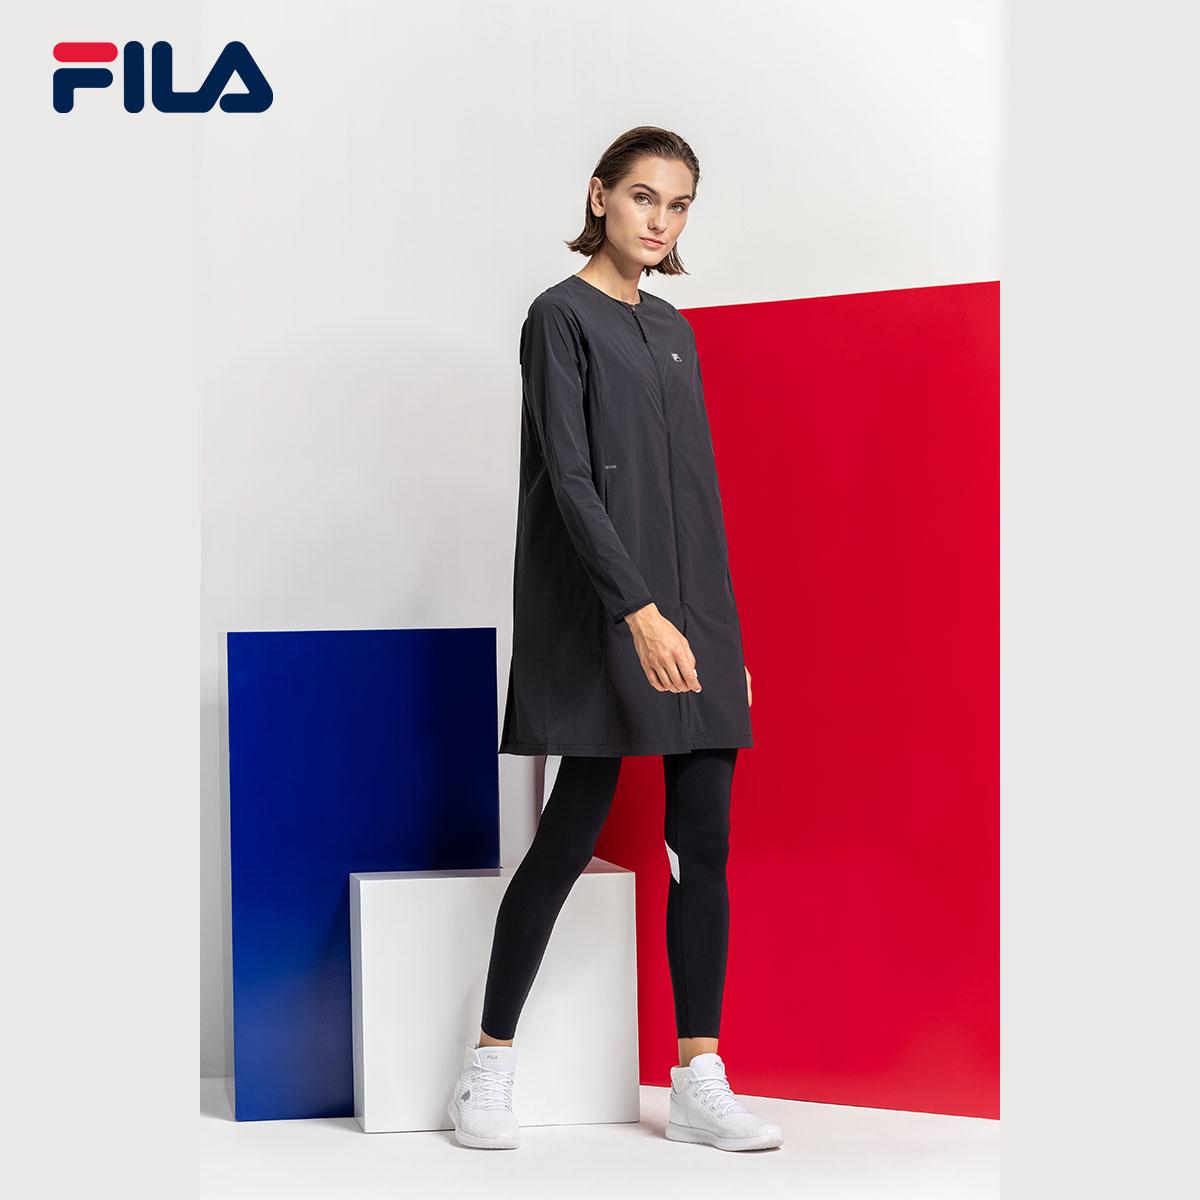 FILA斐乐RED系列女外套2018秋季新款时尚休闲运动梭织圆领上衣女